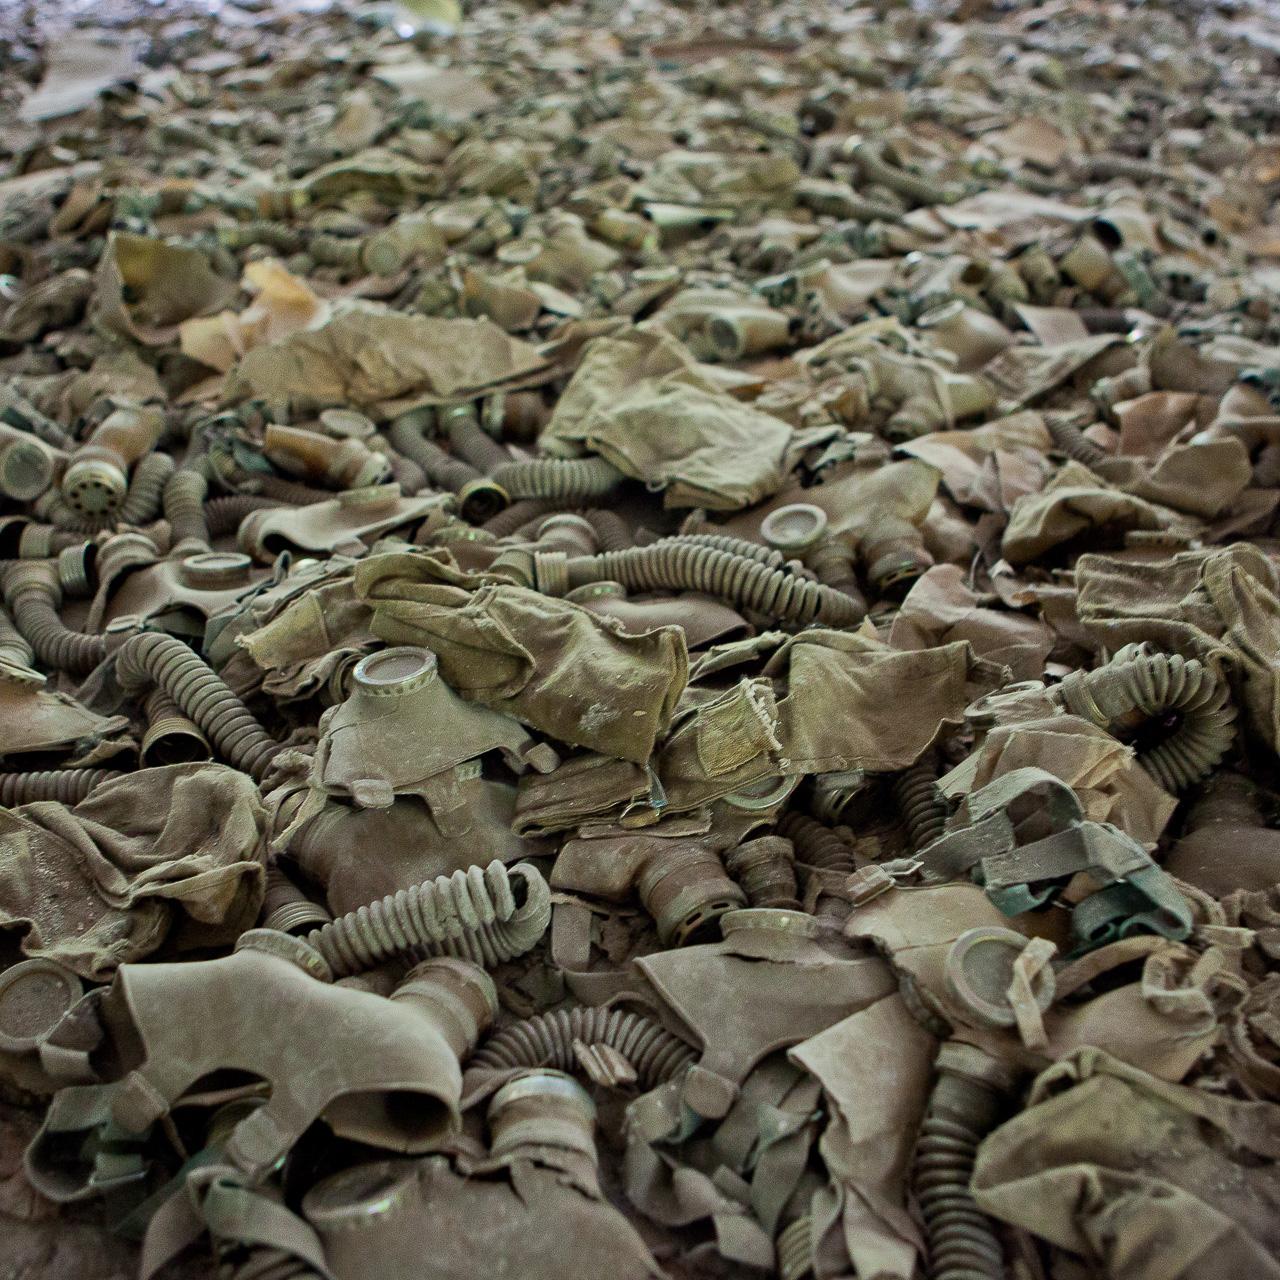 Chernobyl-TodSeelie-13.jpg